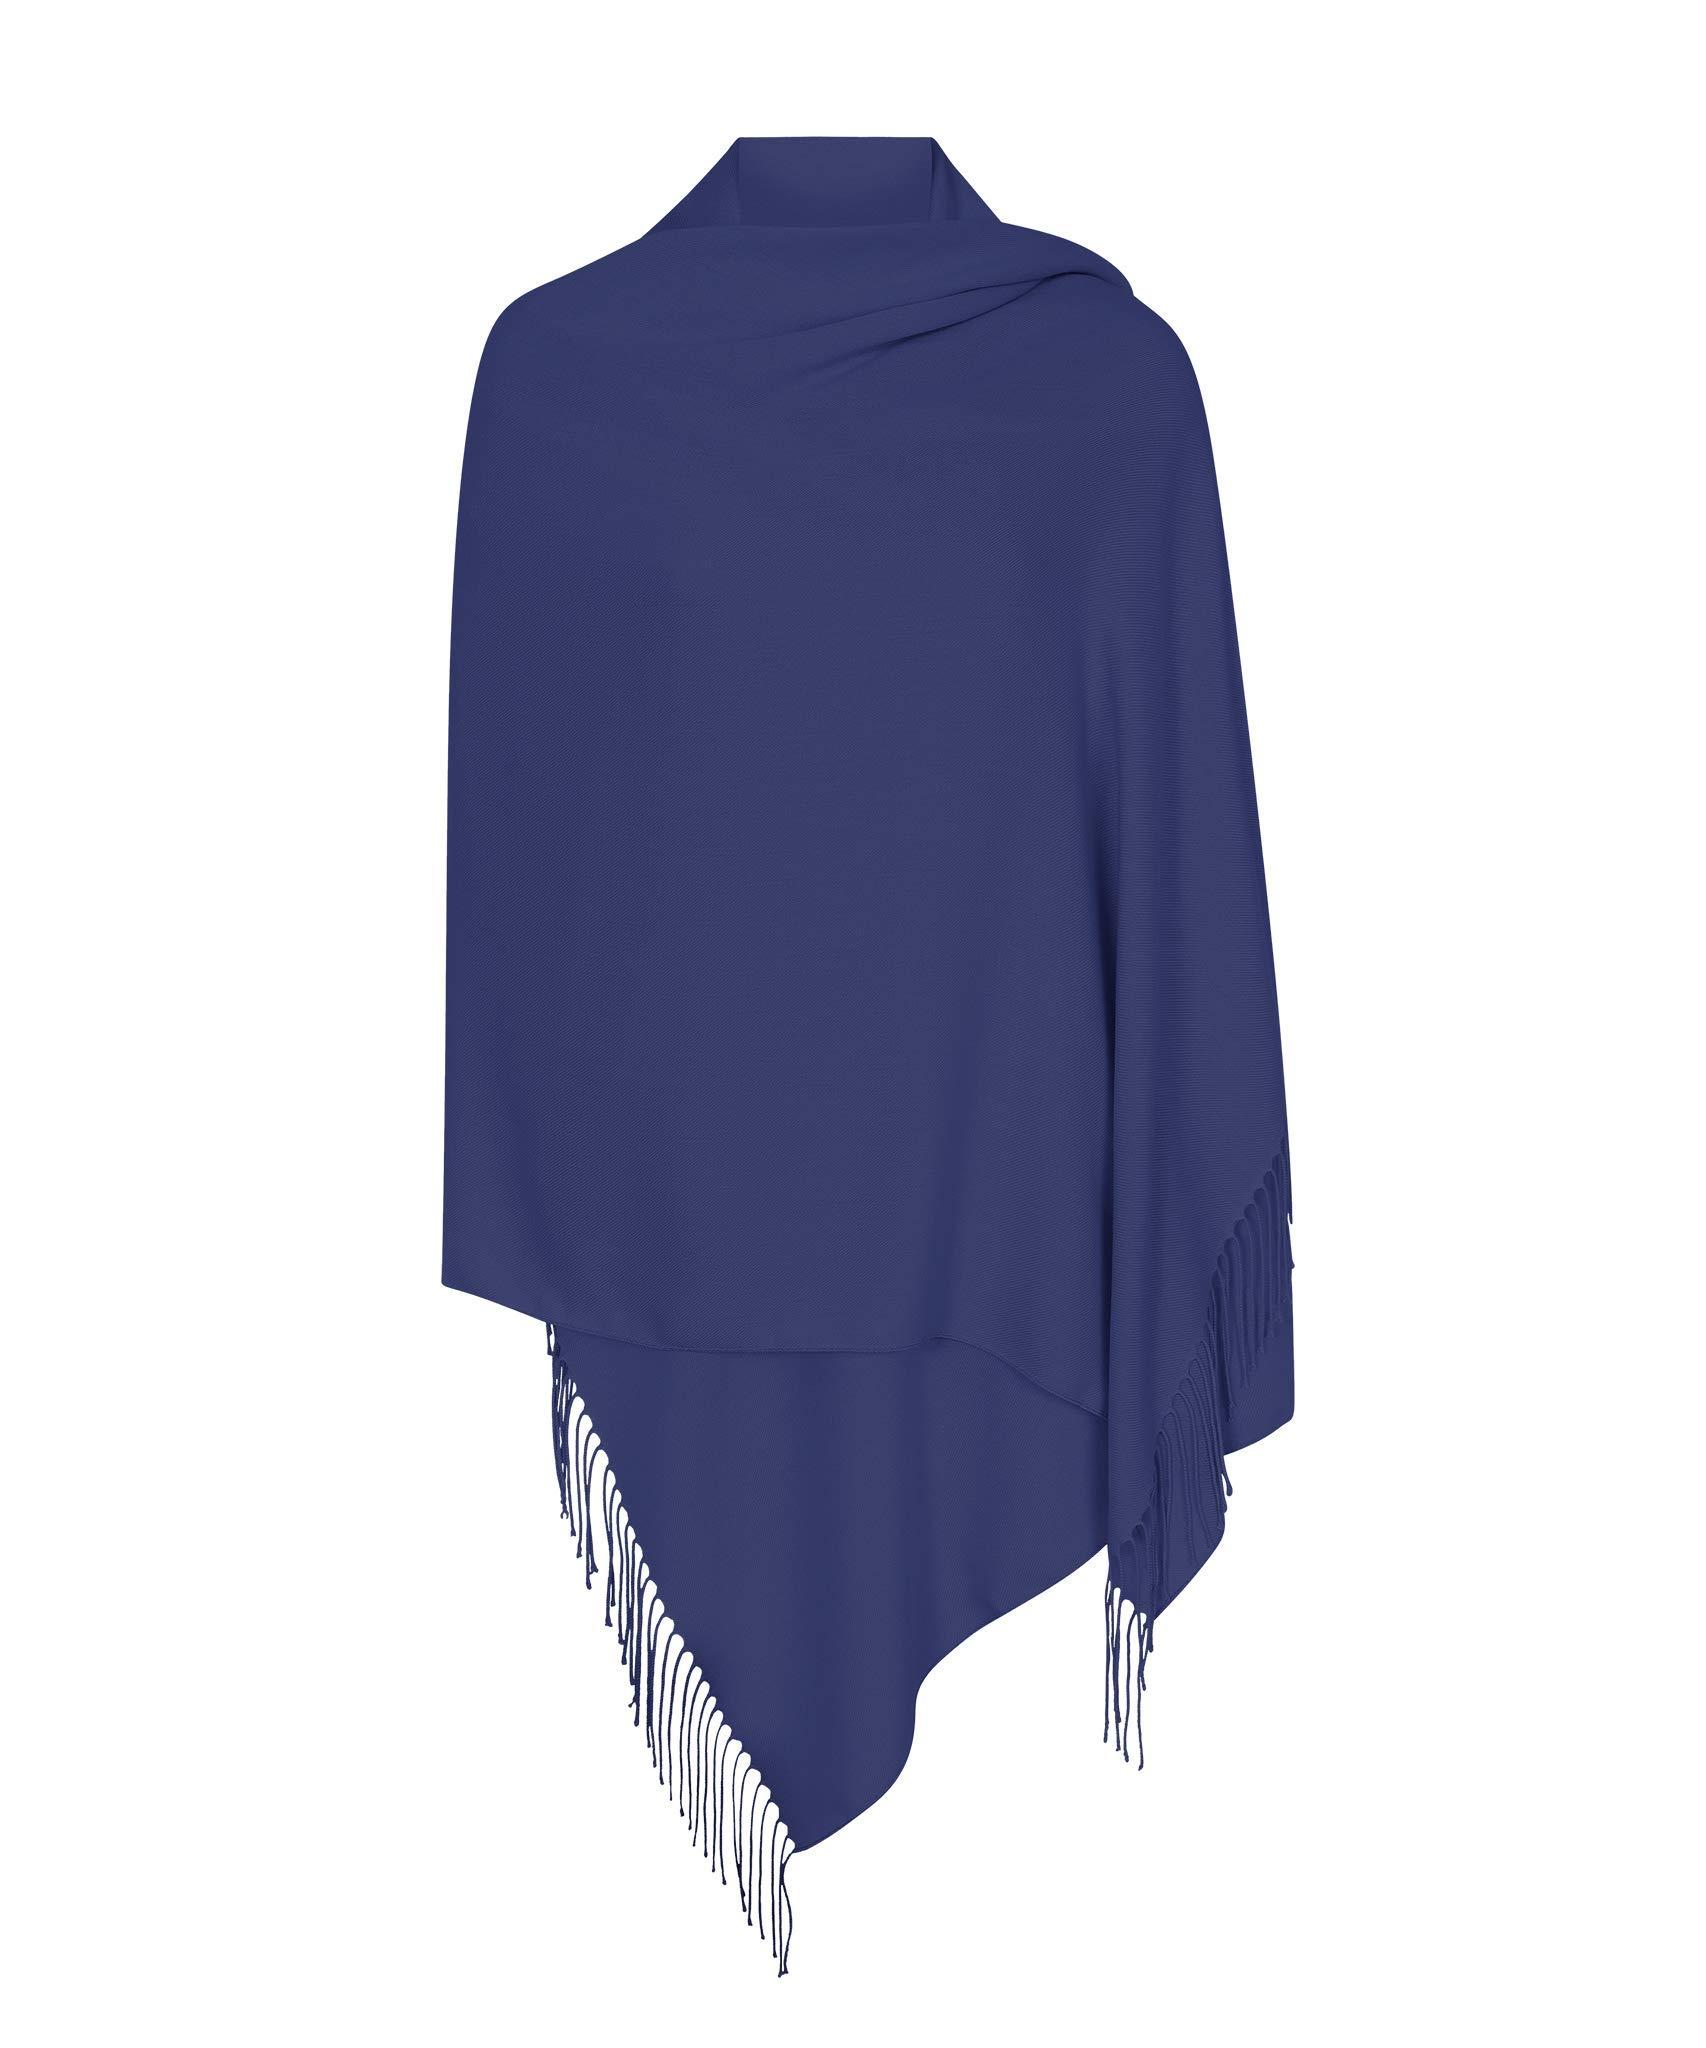 Lucky Point Blue Pashmina Shawl Wrap Scarf - Pashminas & Wraps of London - The Italian Collection - Super Soft